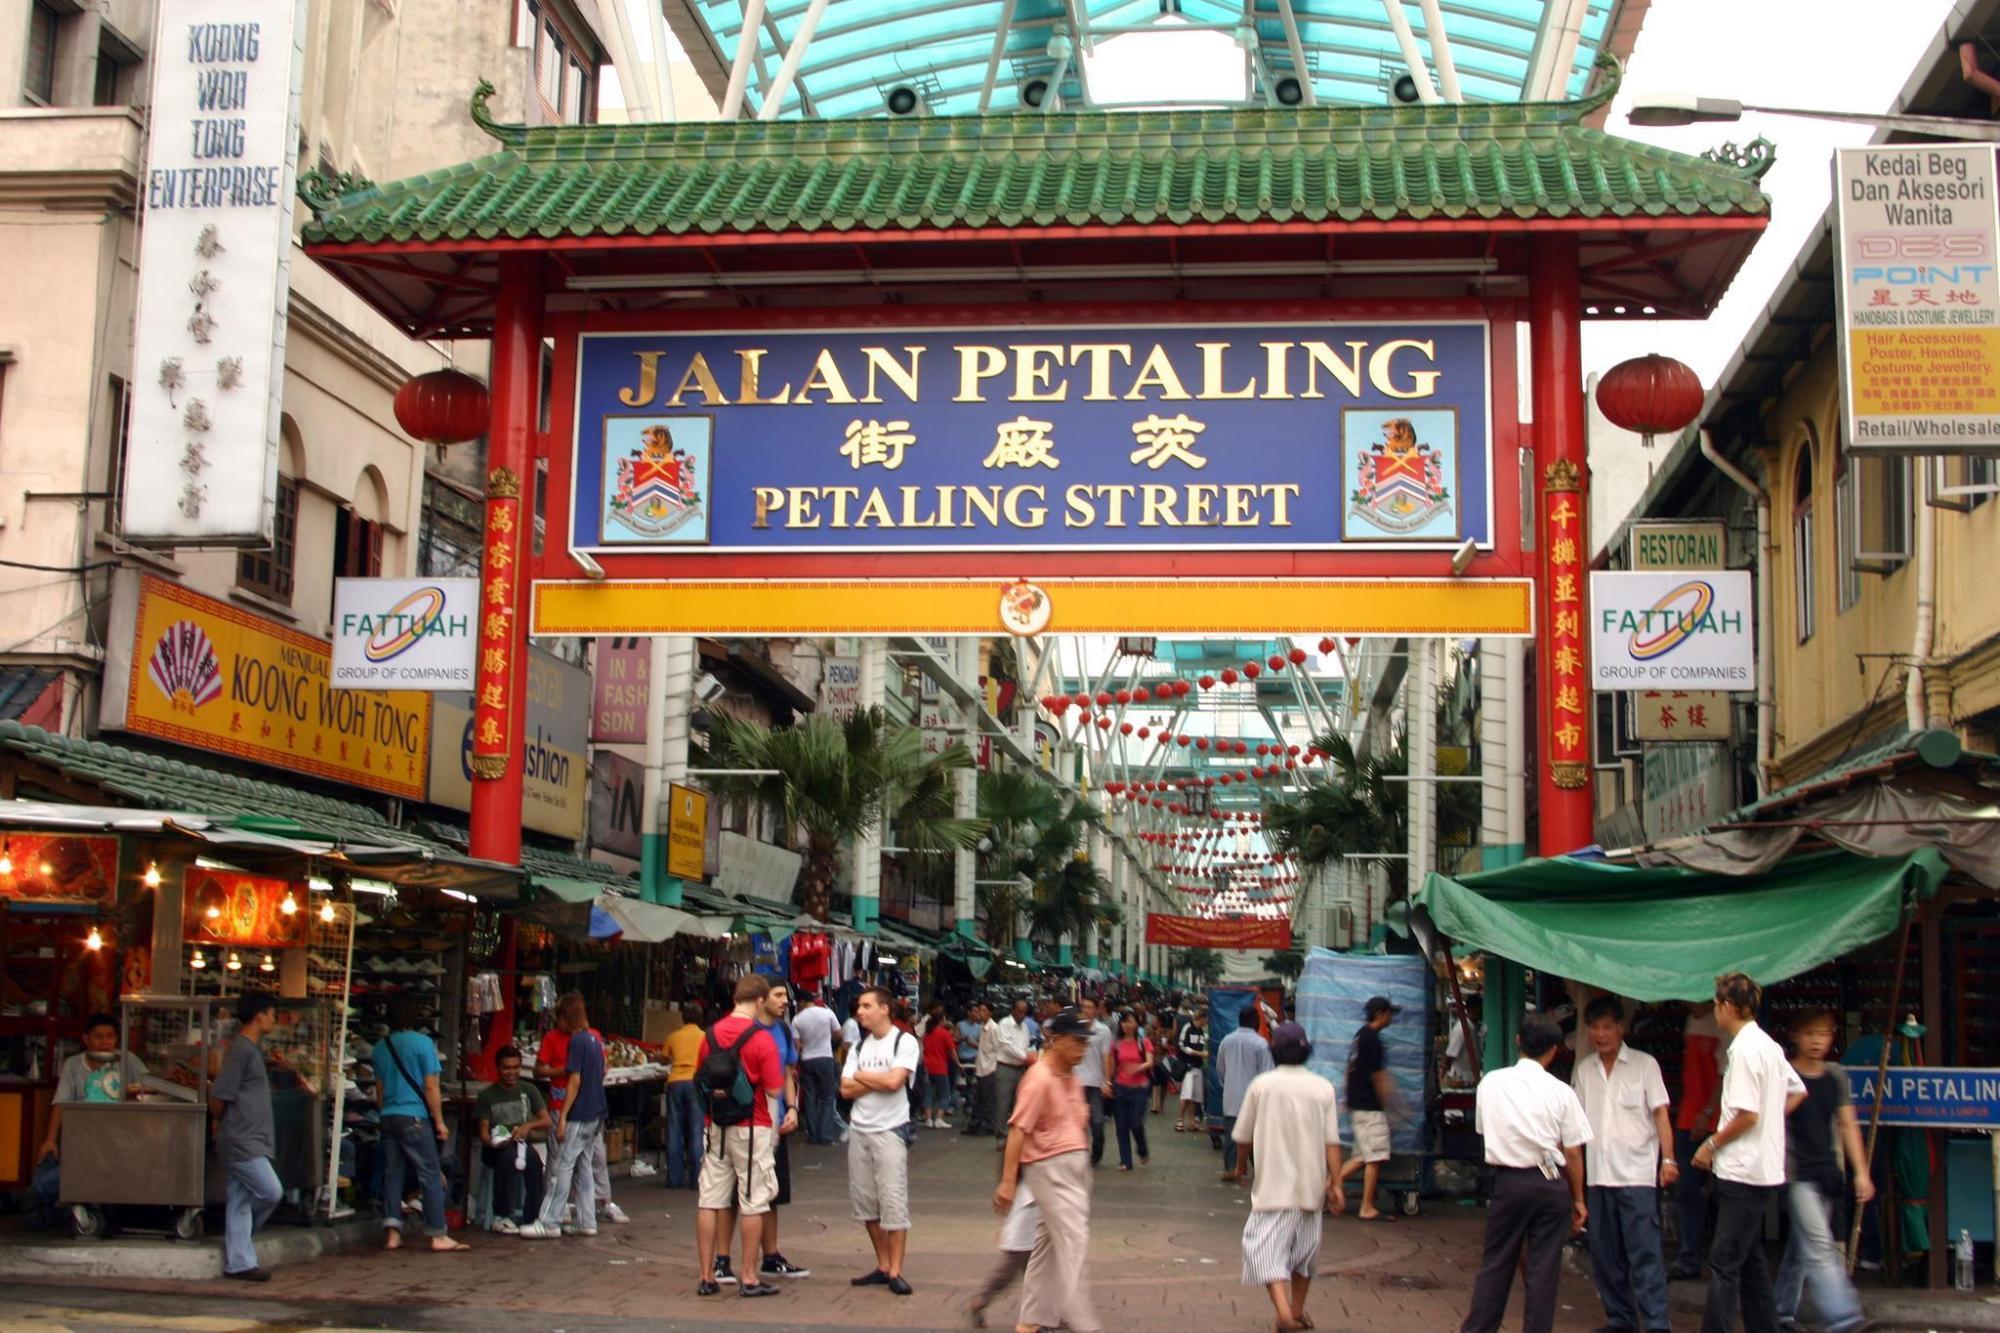 Petaling Street Market | Public Markets